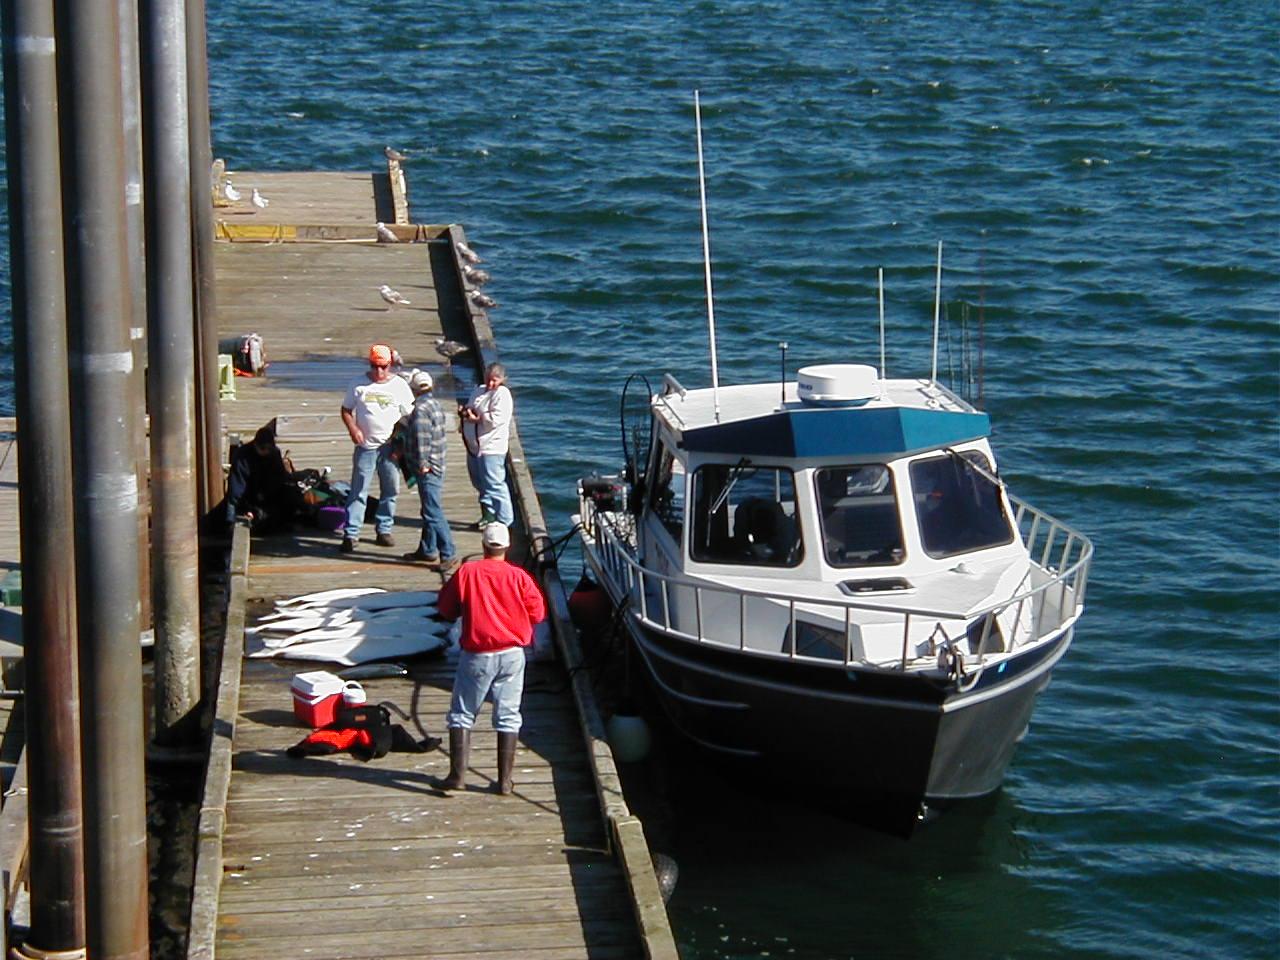 Gustavus dock, charter boat